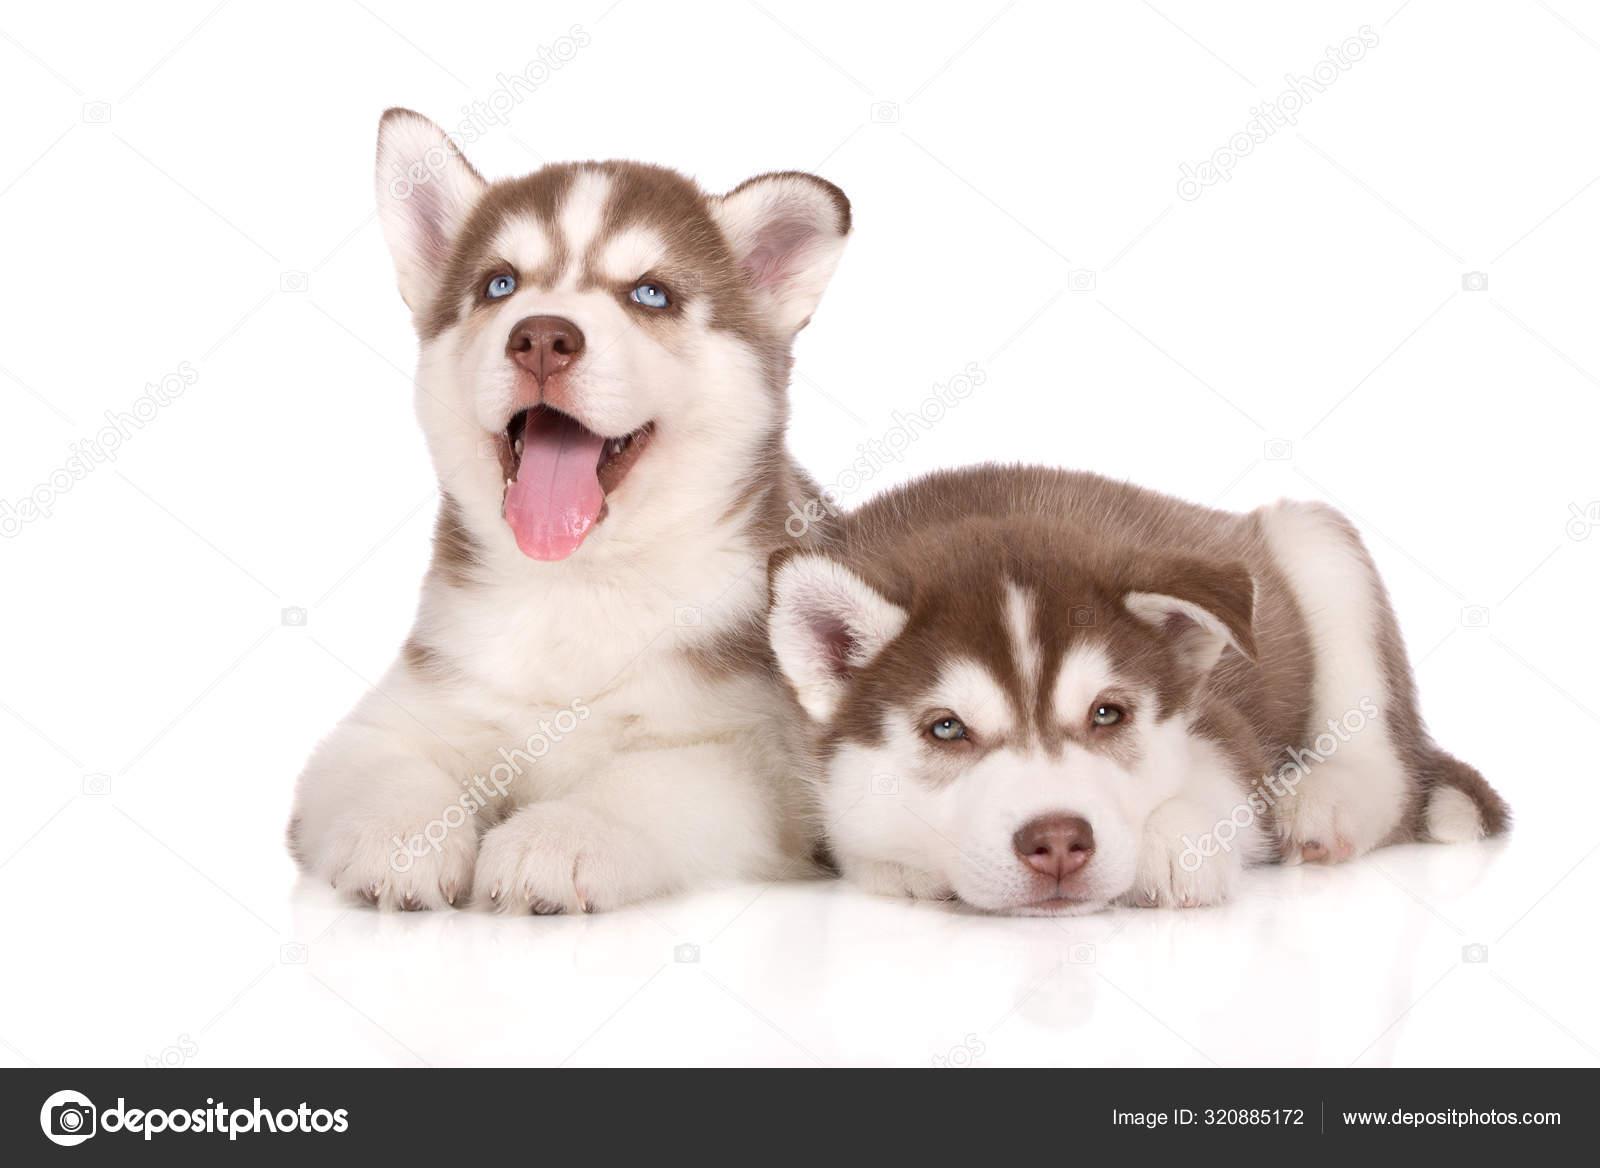 Two Brown Siberian Husky Puppies Posing White Background Stock Photo C Ots Photo 320885172